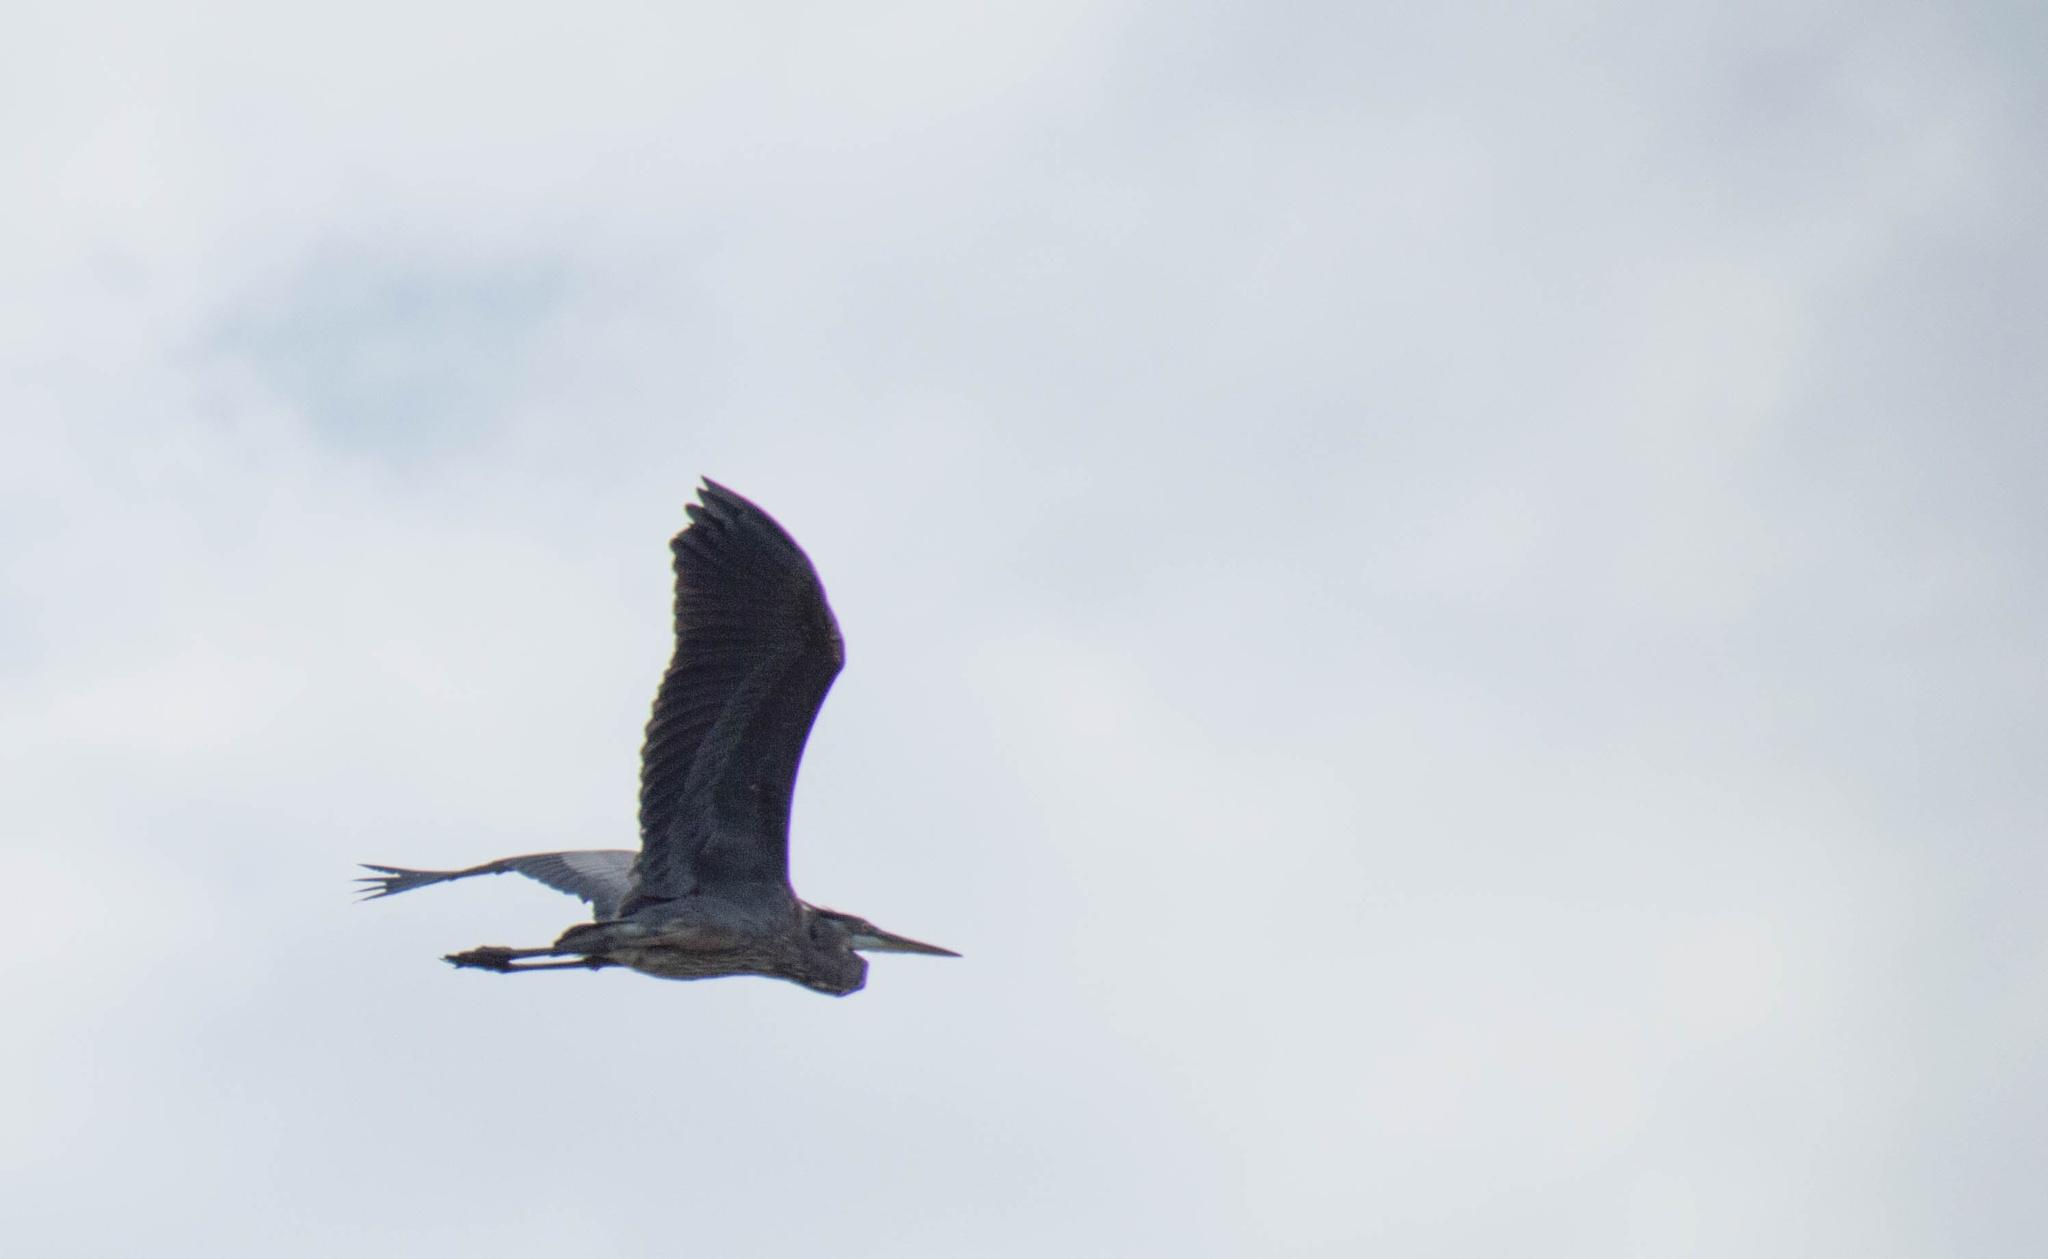 Heron by maniusia1